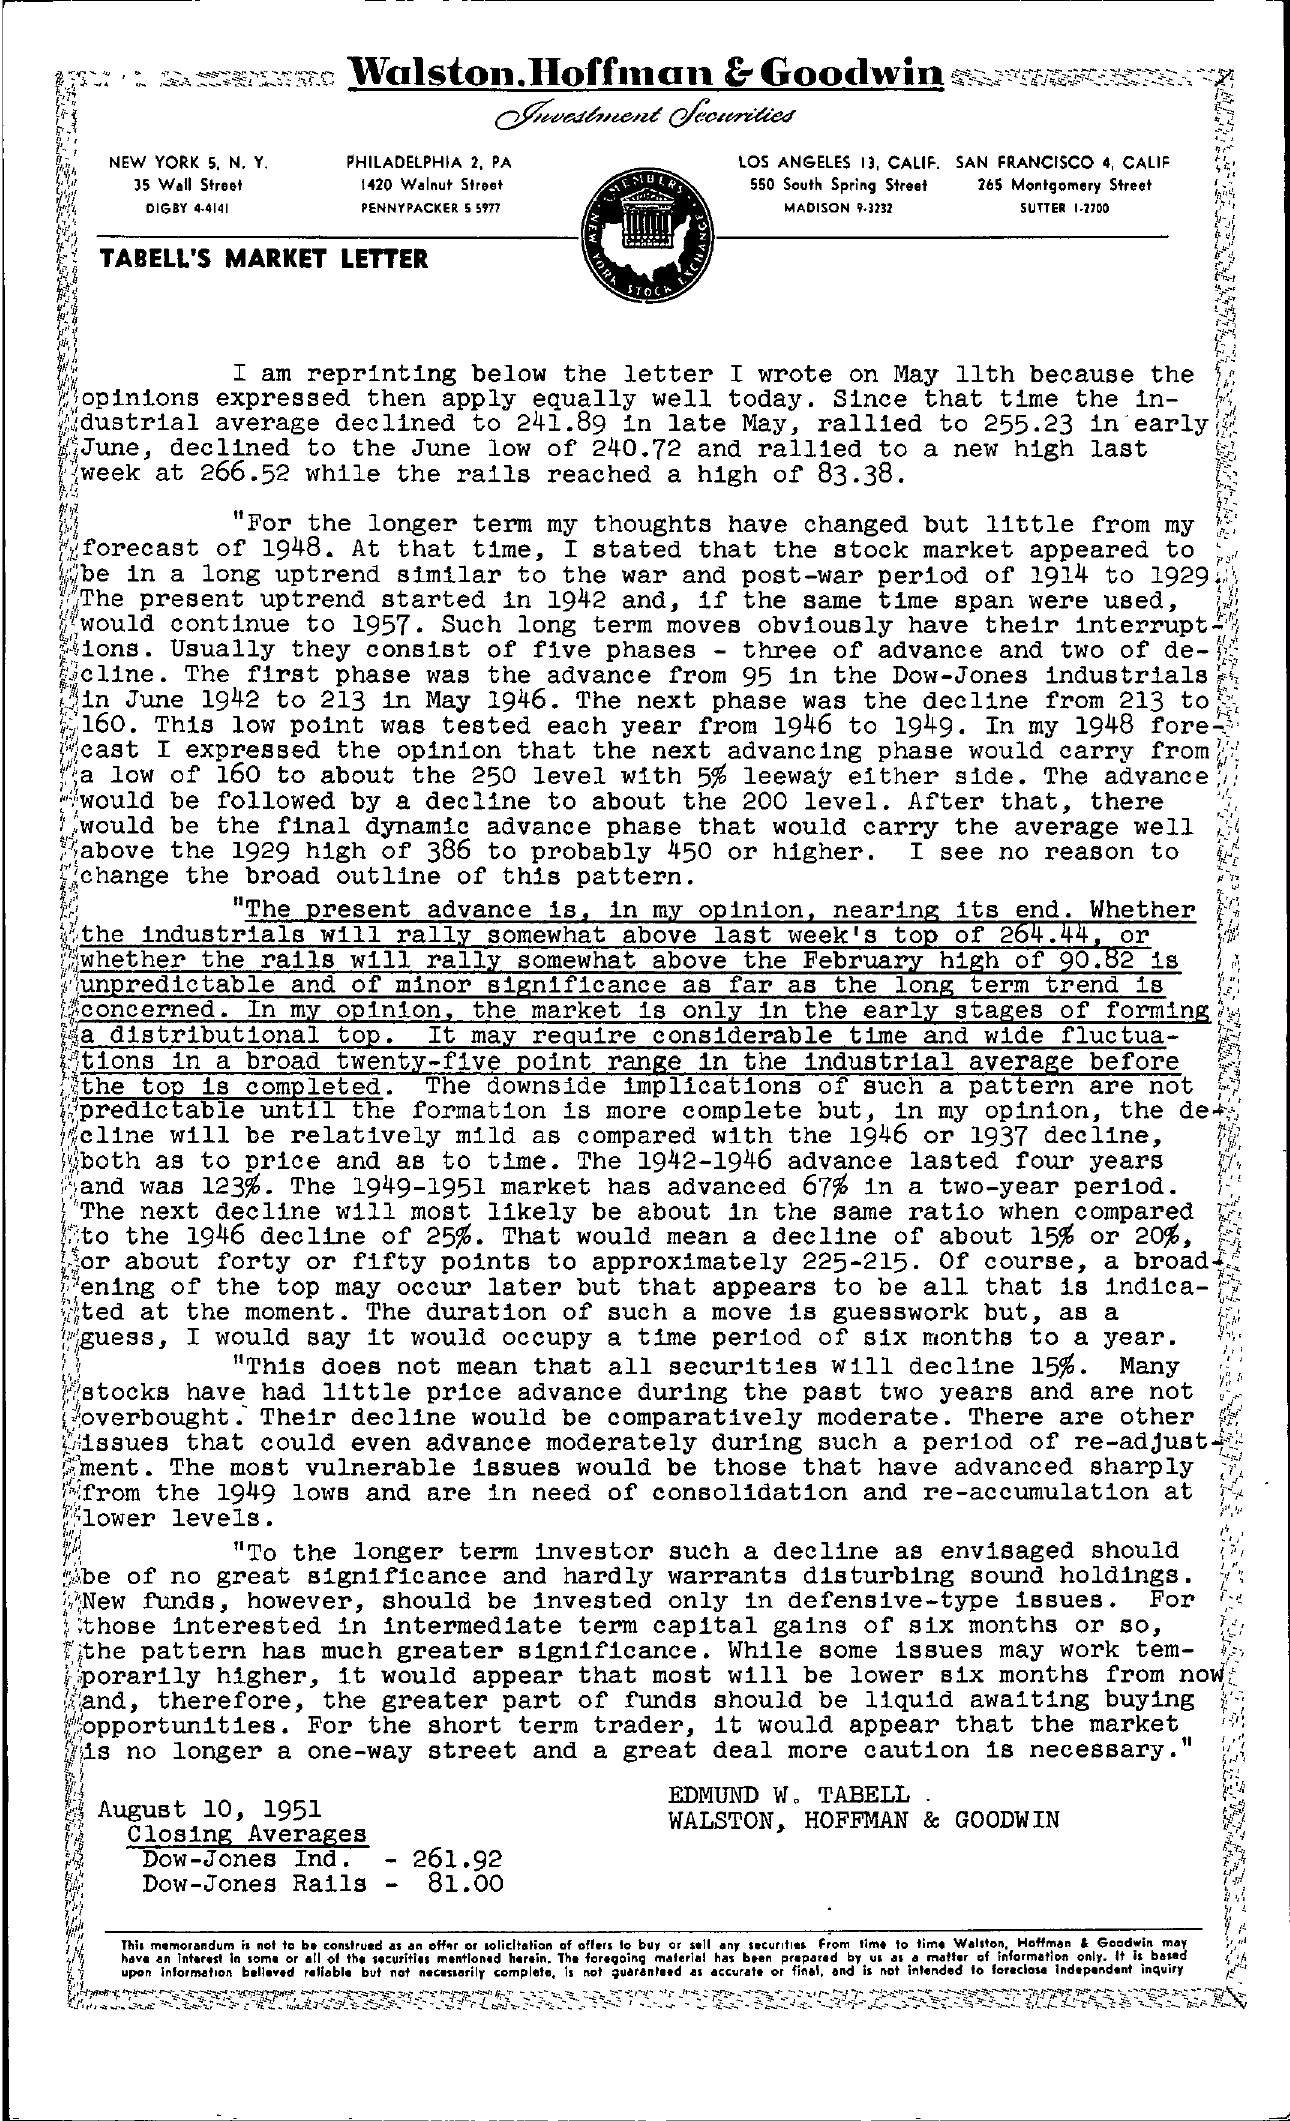 Tabell's Market Letter - August 10, 1951